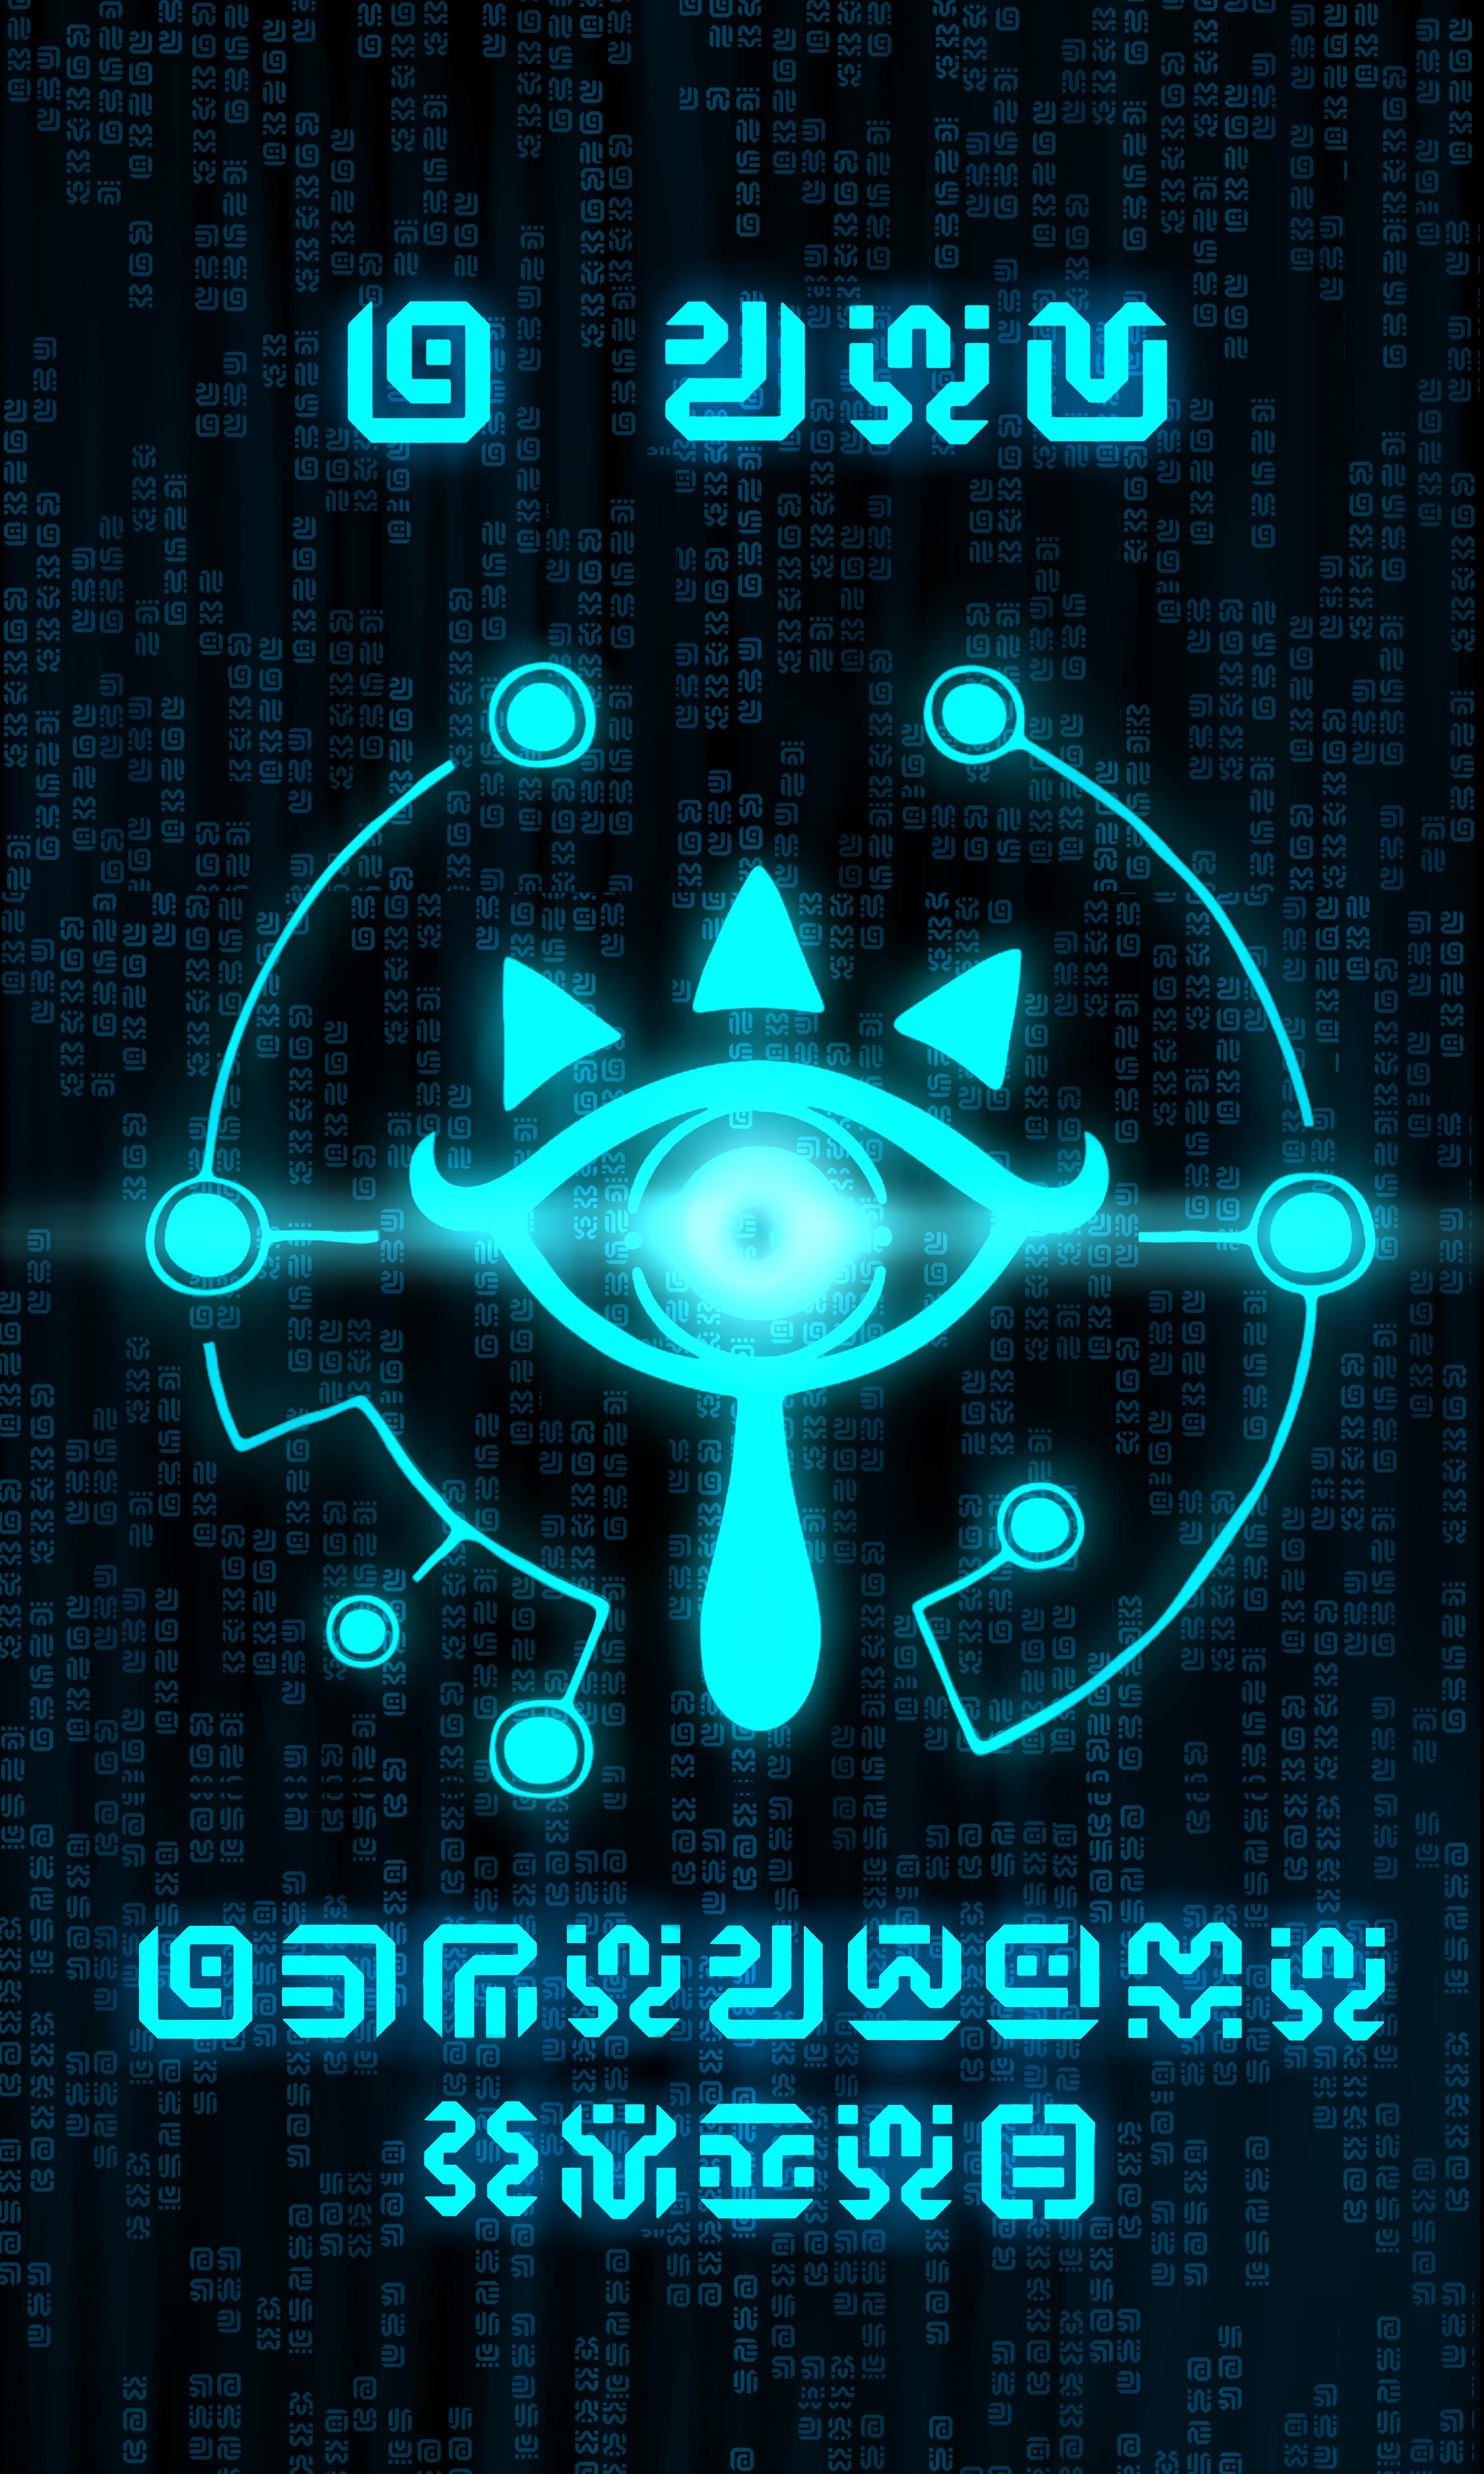 The Legend Of Zelda Mobile Wallpaper By Linkwolf64 On Deviantart